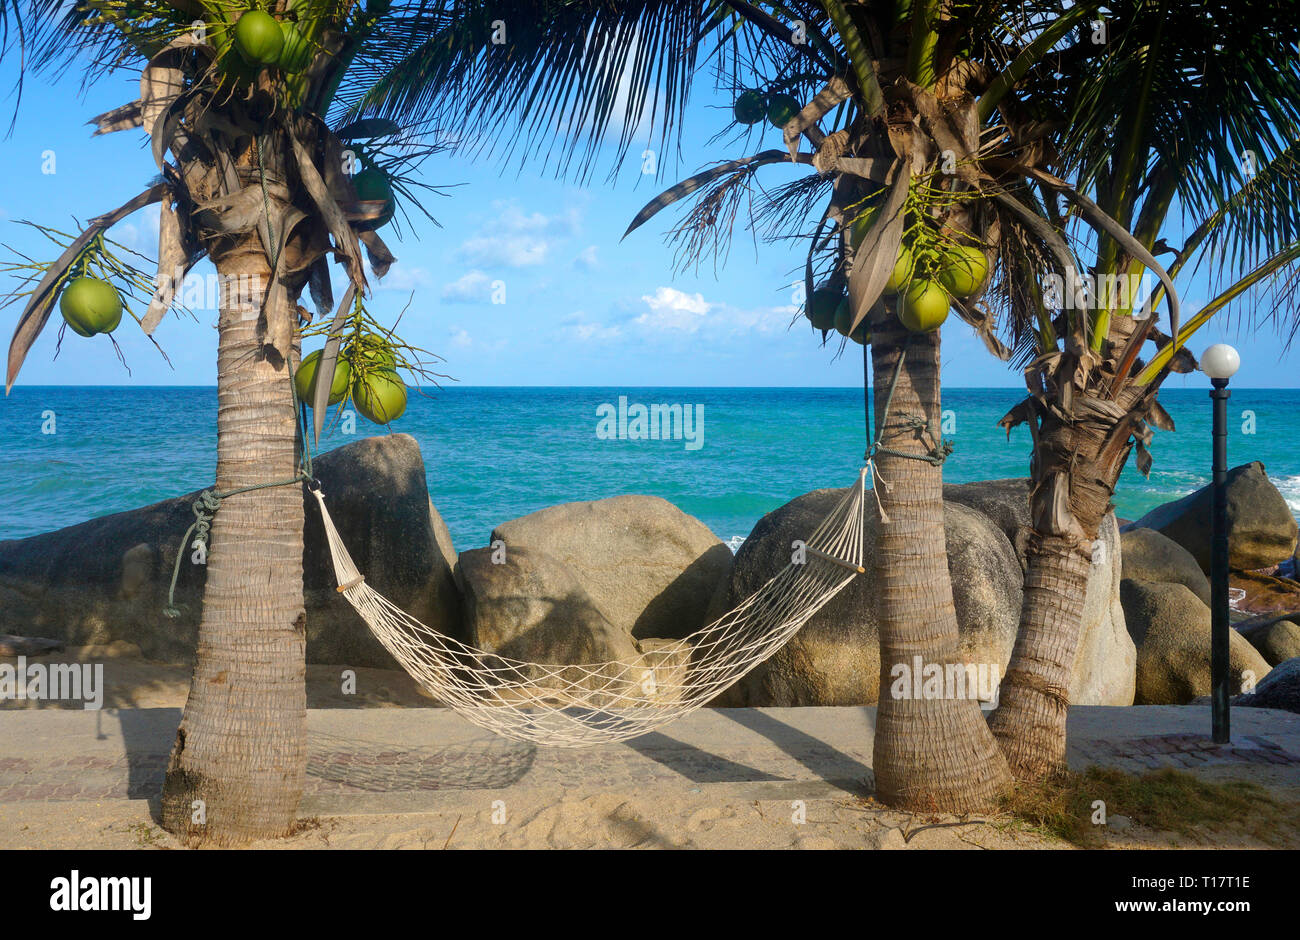 Hammock between to palm trees at Lamai Beach, Koh Samui, Gulf of Thailand, Thailand - Stock Image